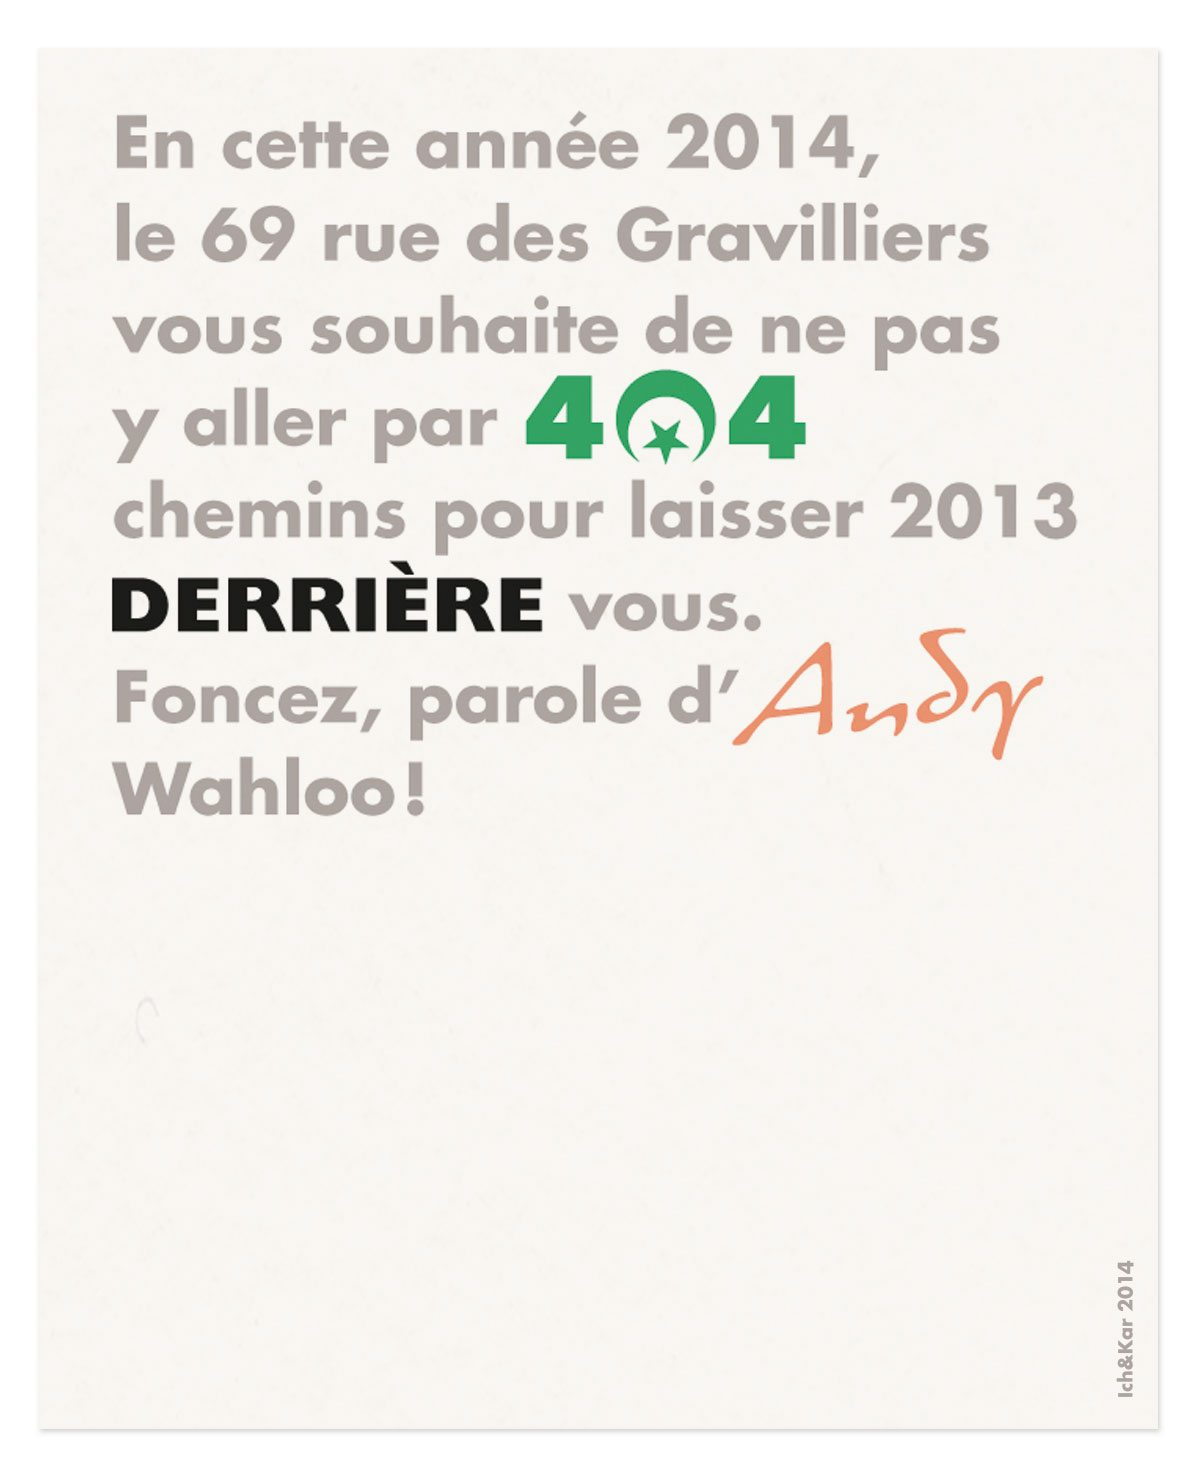 404 derrière andy wahloo 69 rue des gravilliers vœux 2014